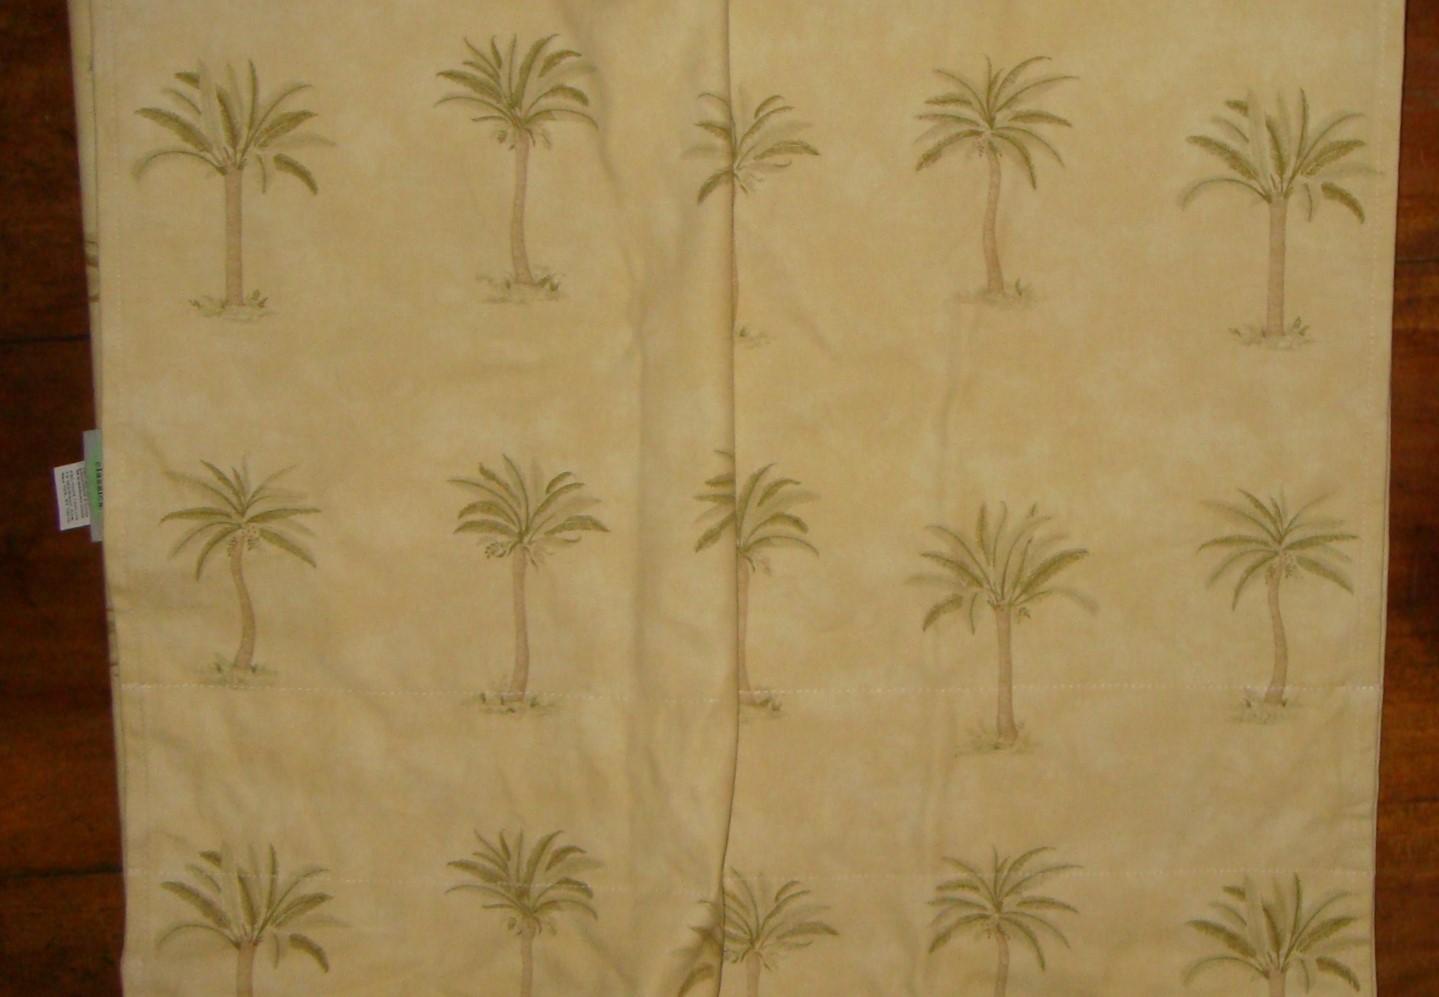 Waverly Tahiti Palm Trees Window Treatment Valance